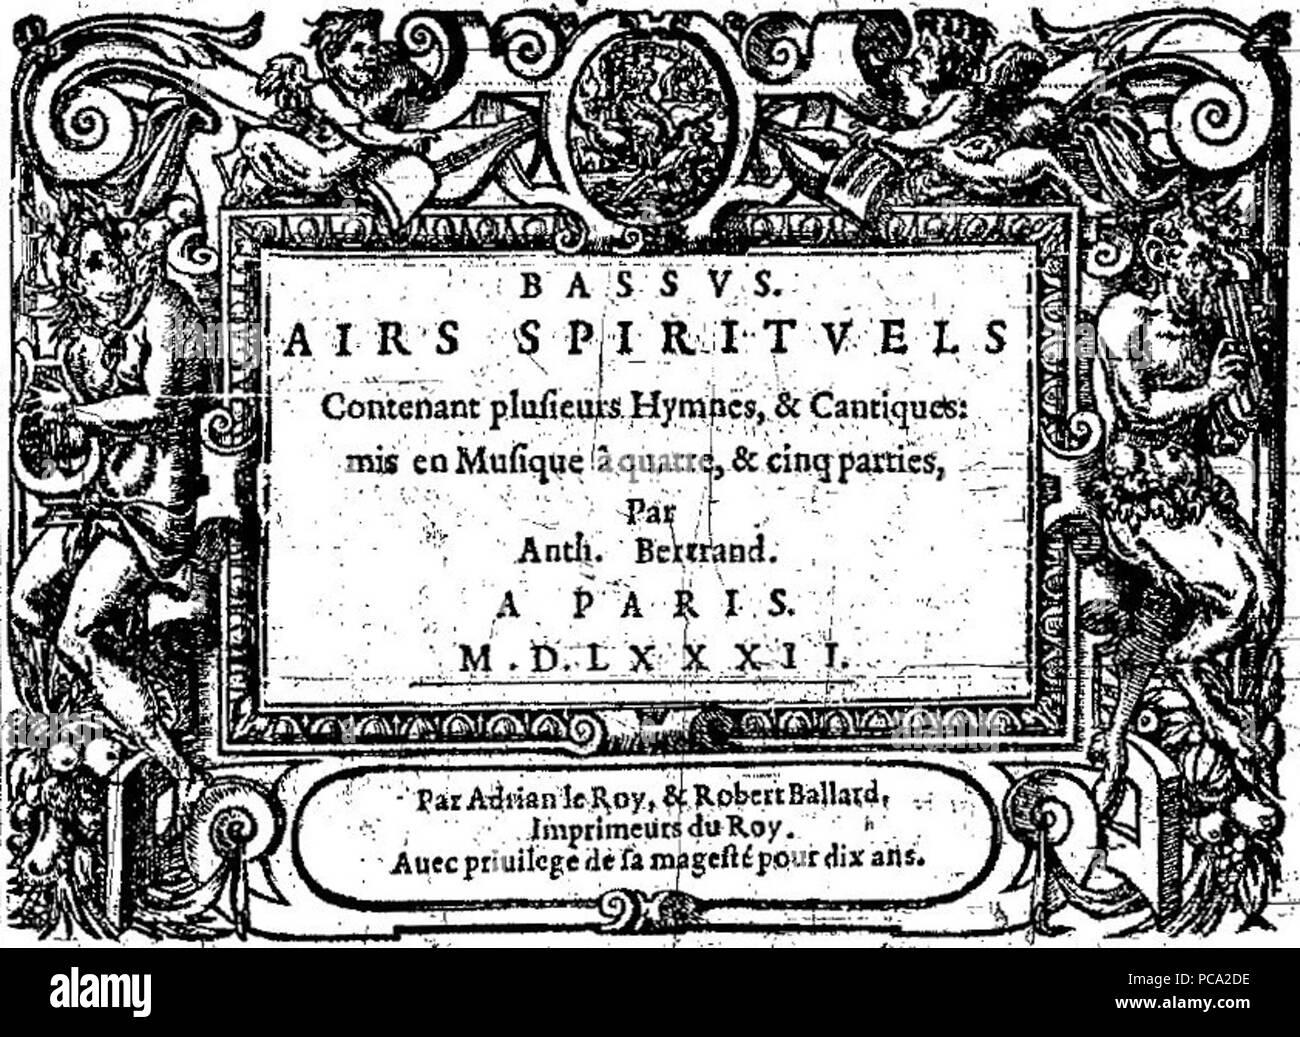 82 Bertrand Airs 1582 - Stock Image